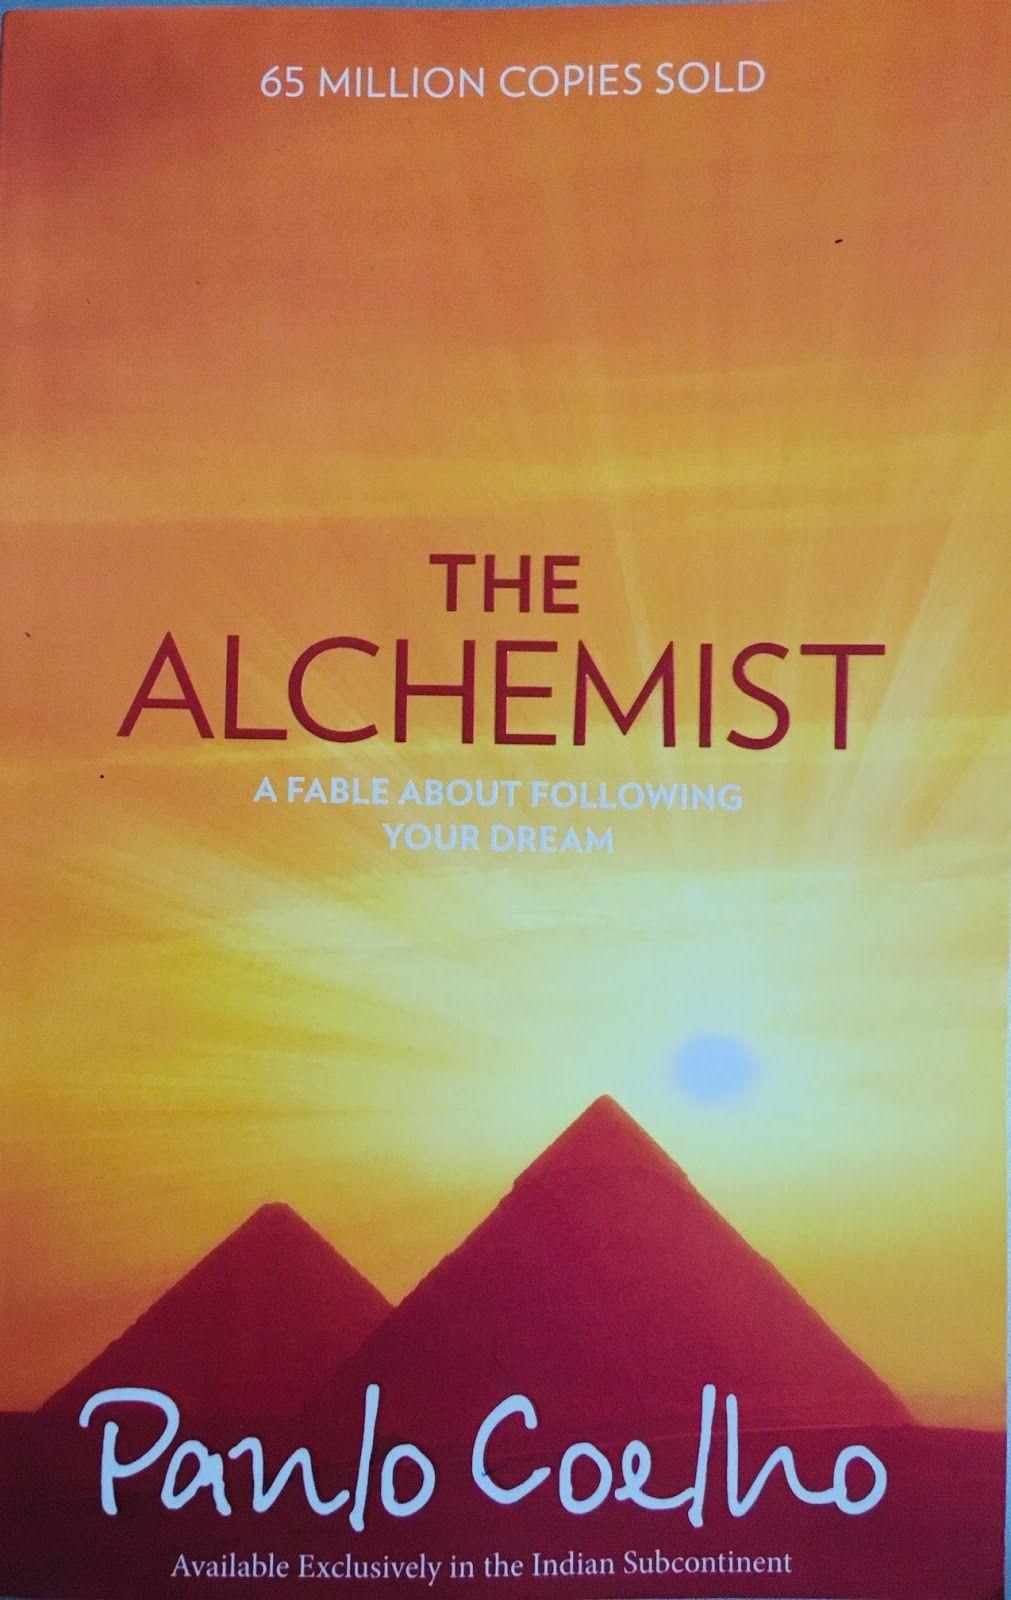 The Alchemist in 2020 Alchemist book, The alchemist